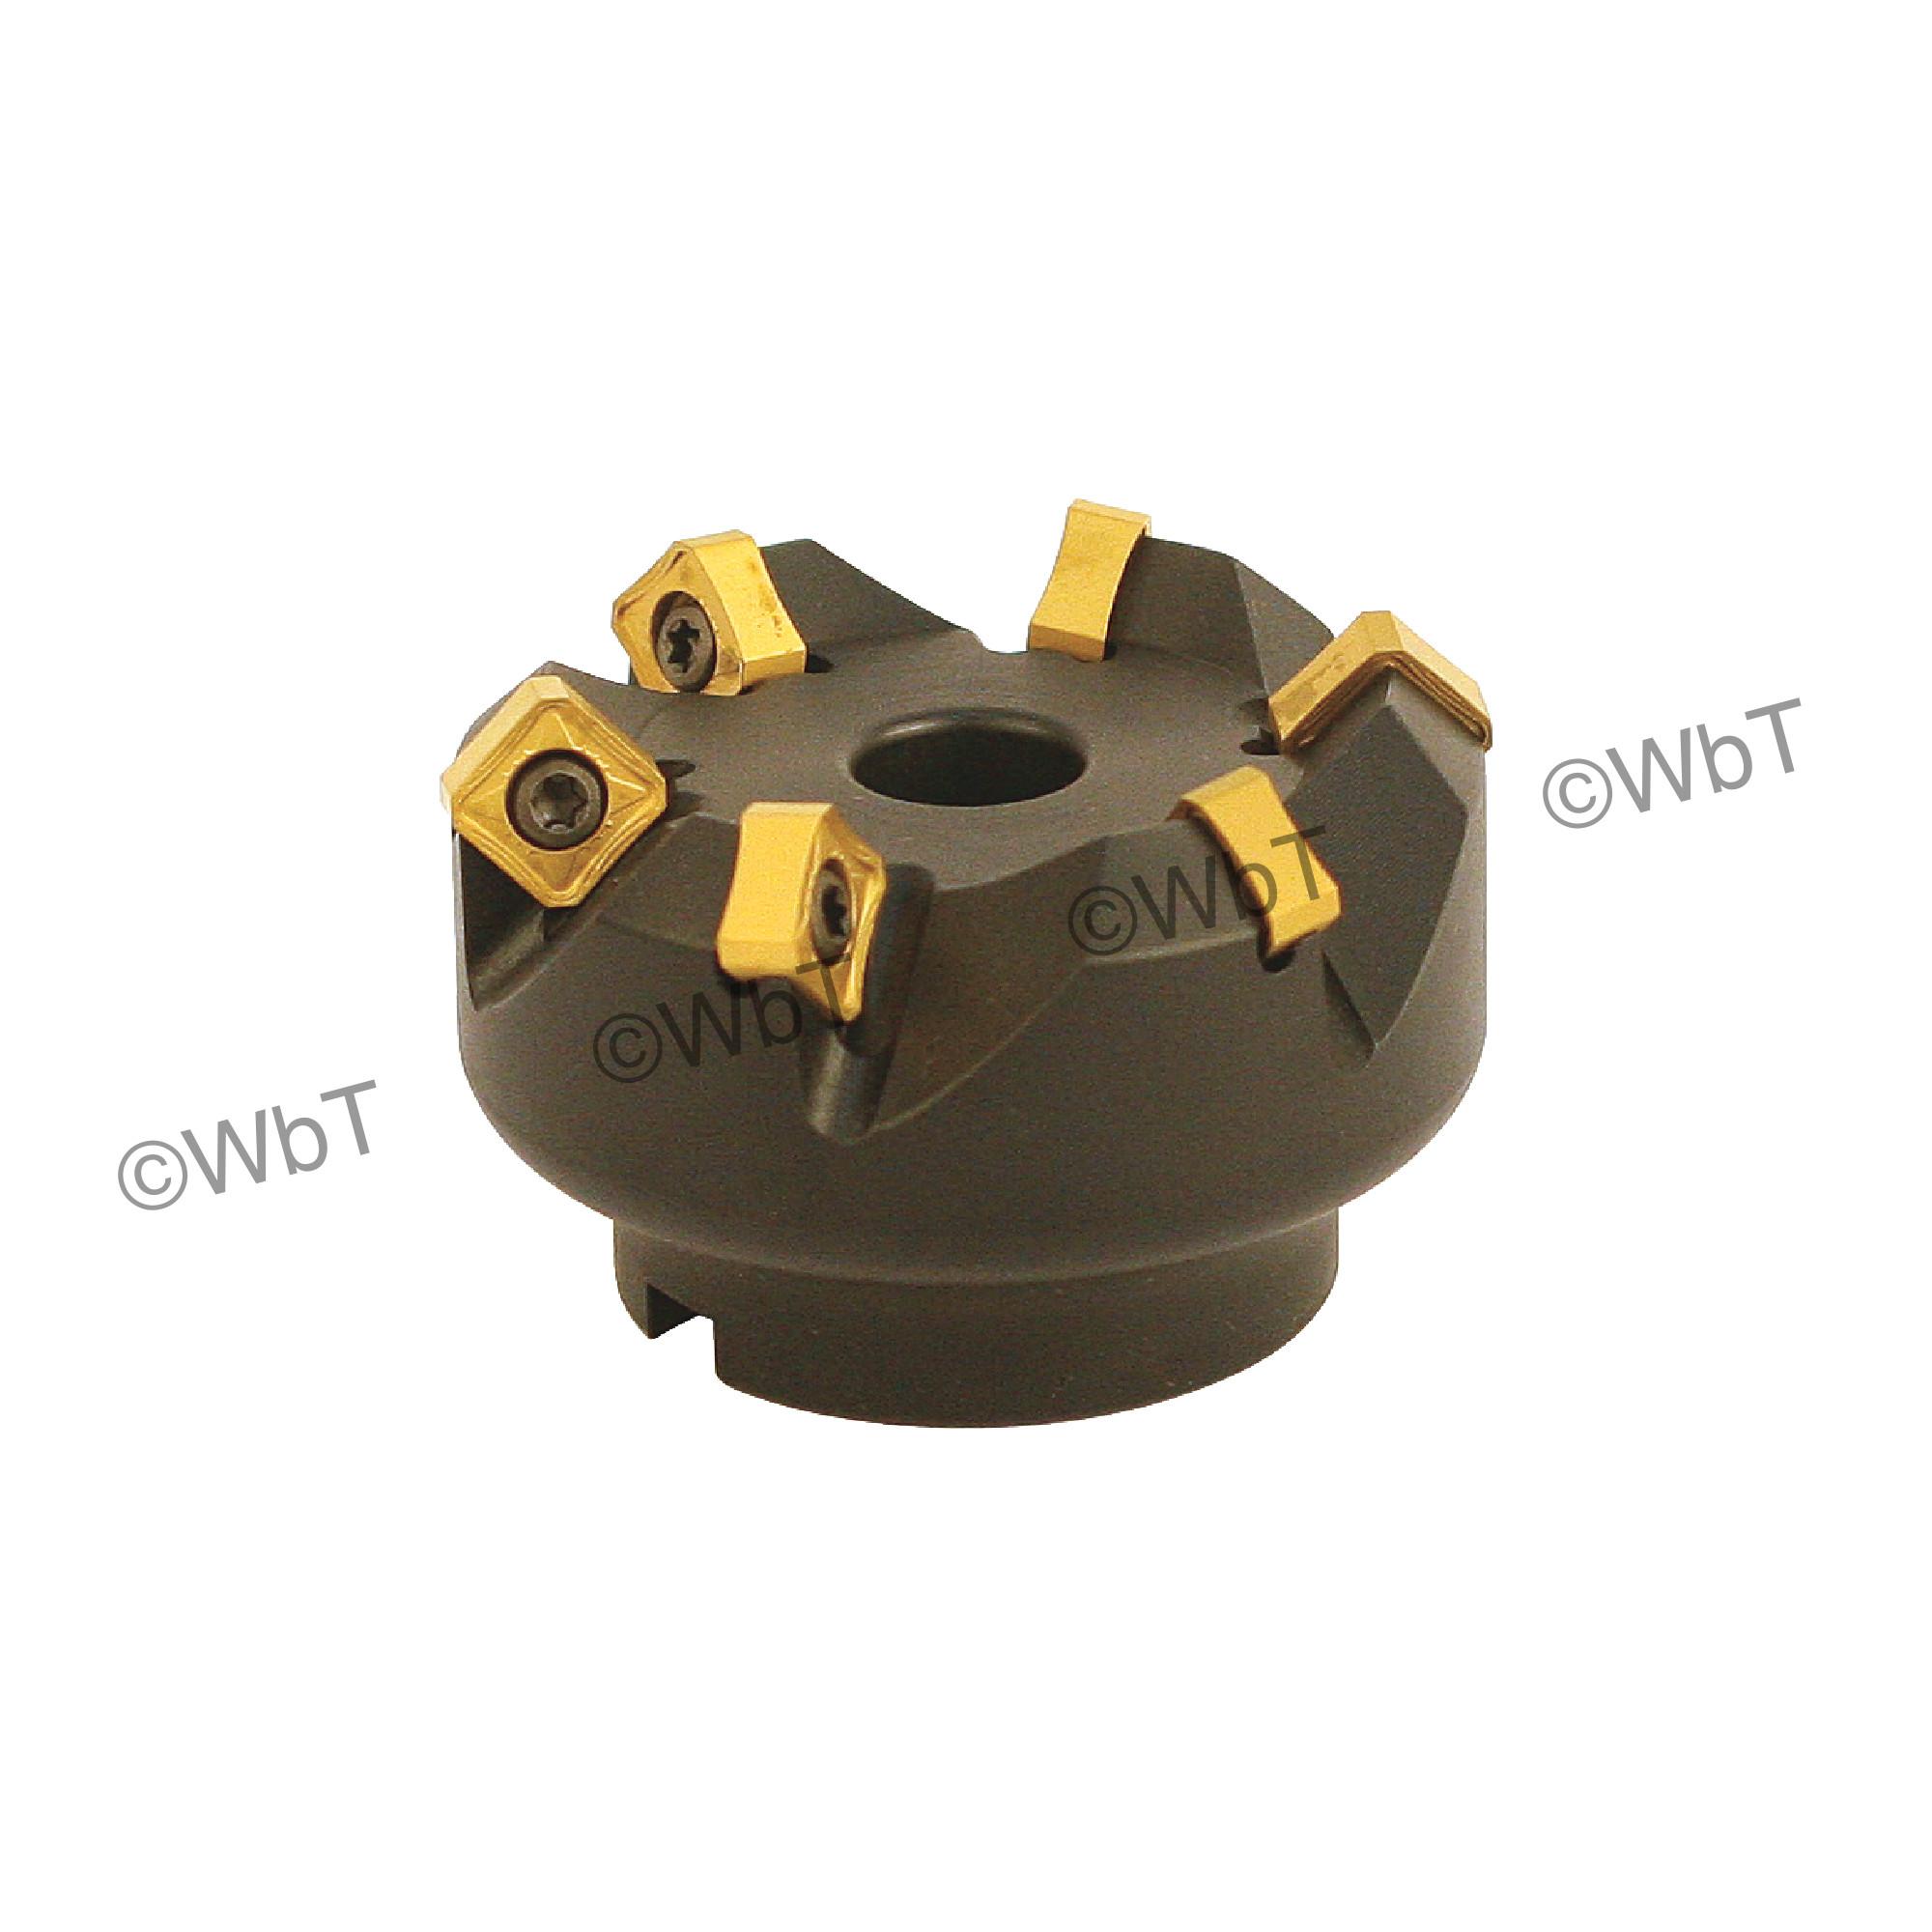 "AKUMA - 2.500"" - 45° Face Mill Set / Includes: (1) SNAC.12.250R-6 (2.5"" ø) & (10) SNMX1205ANN-M1 CM30P Coate"